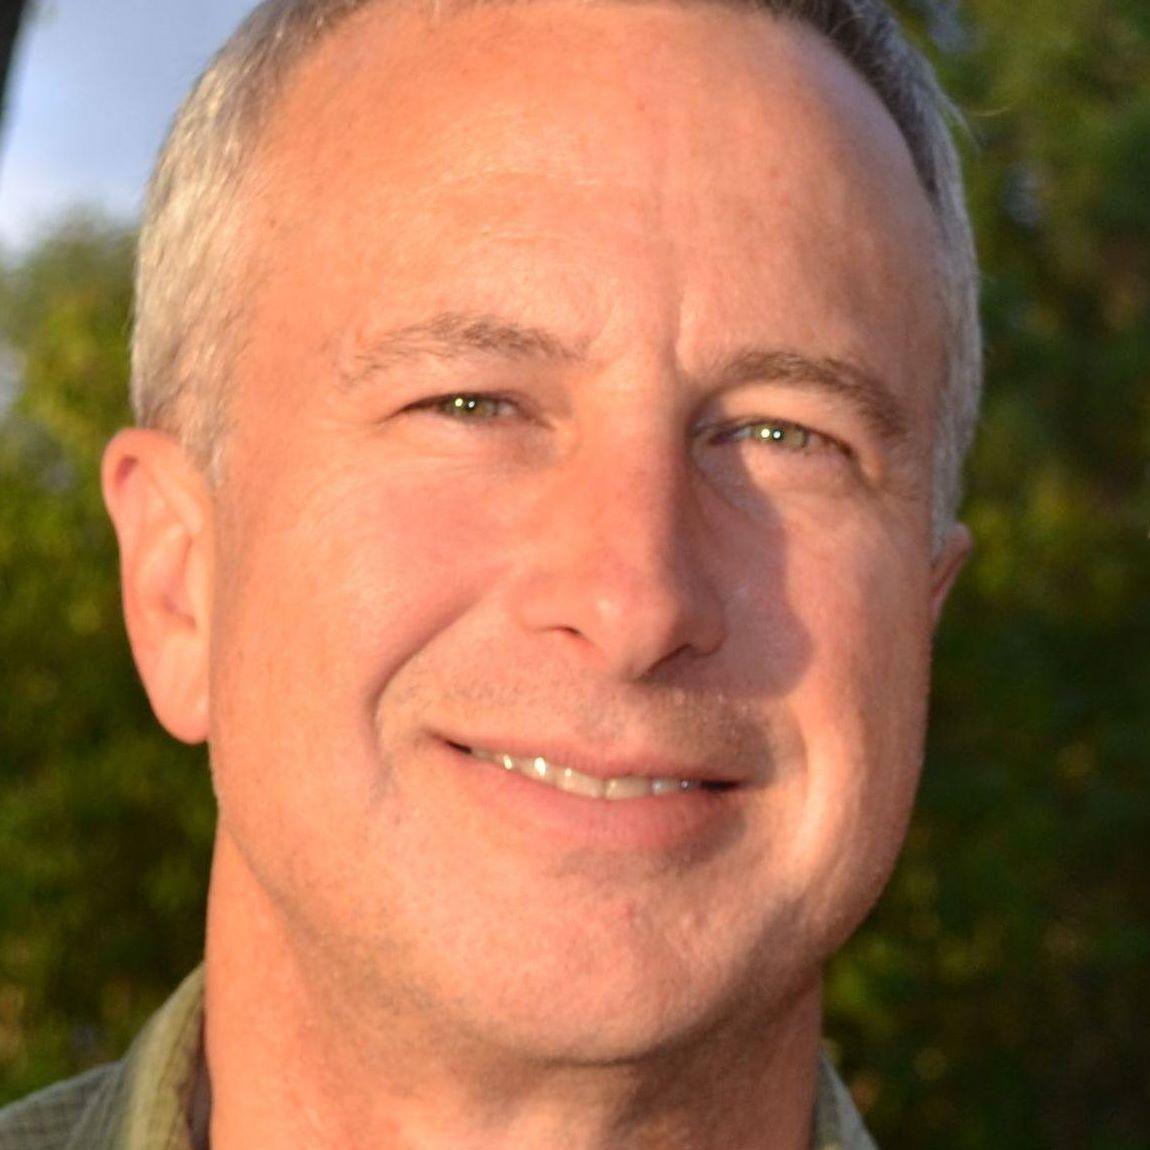 Pete digman